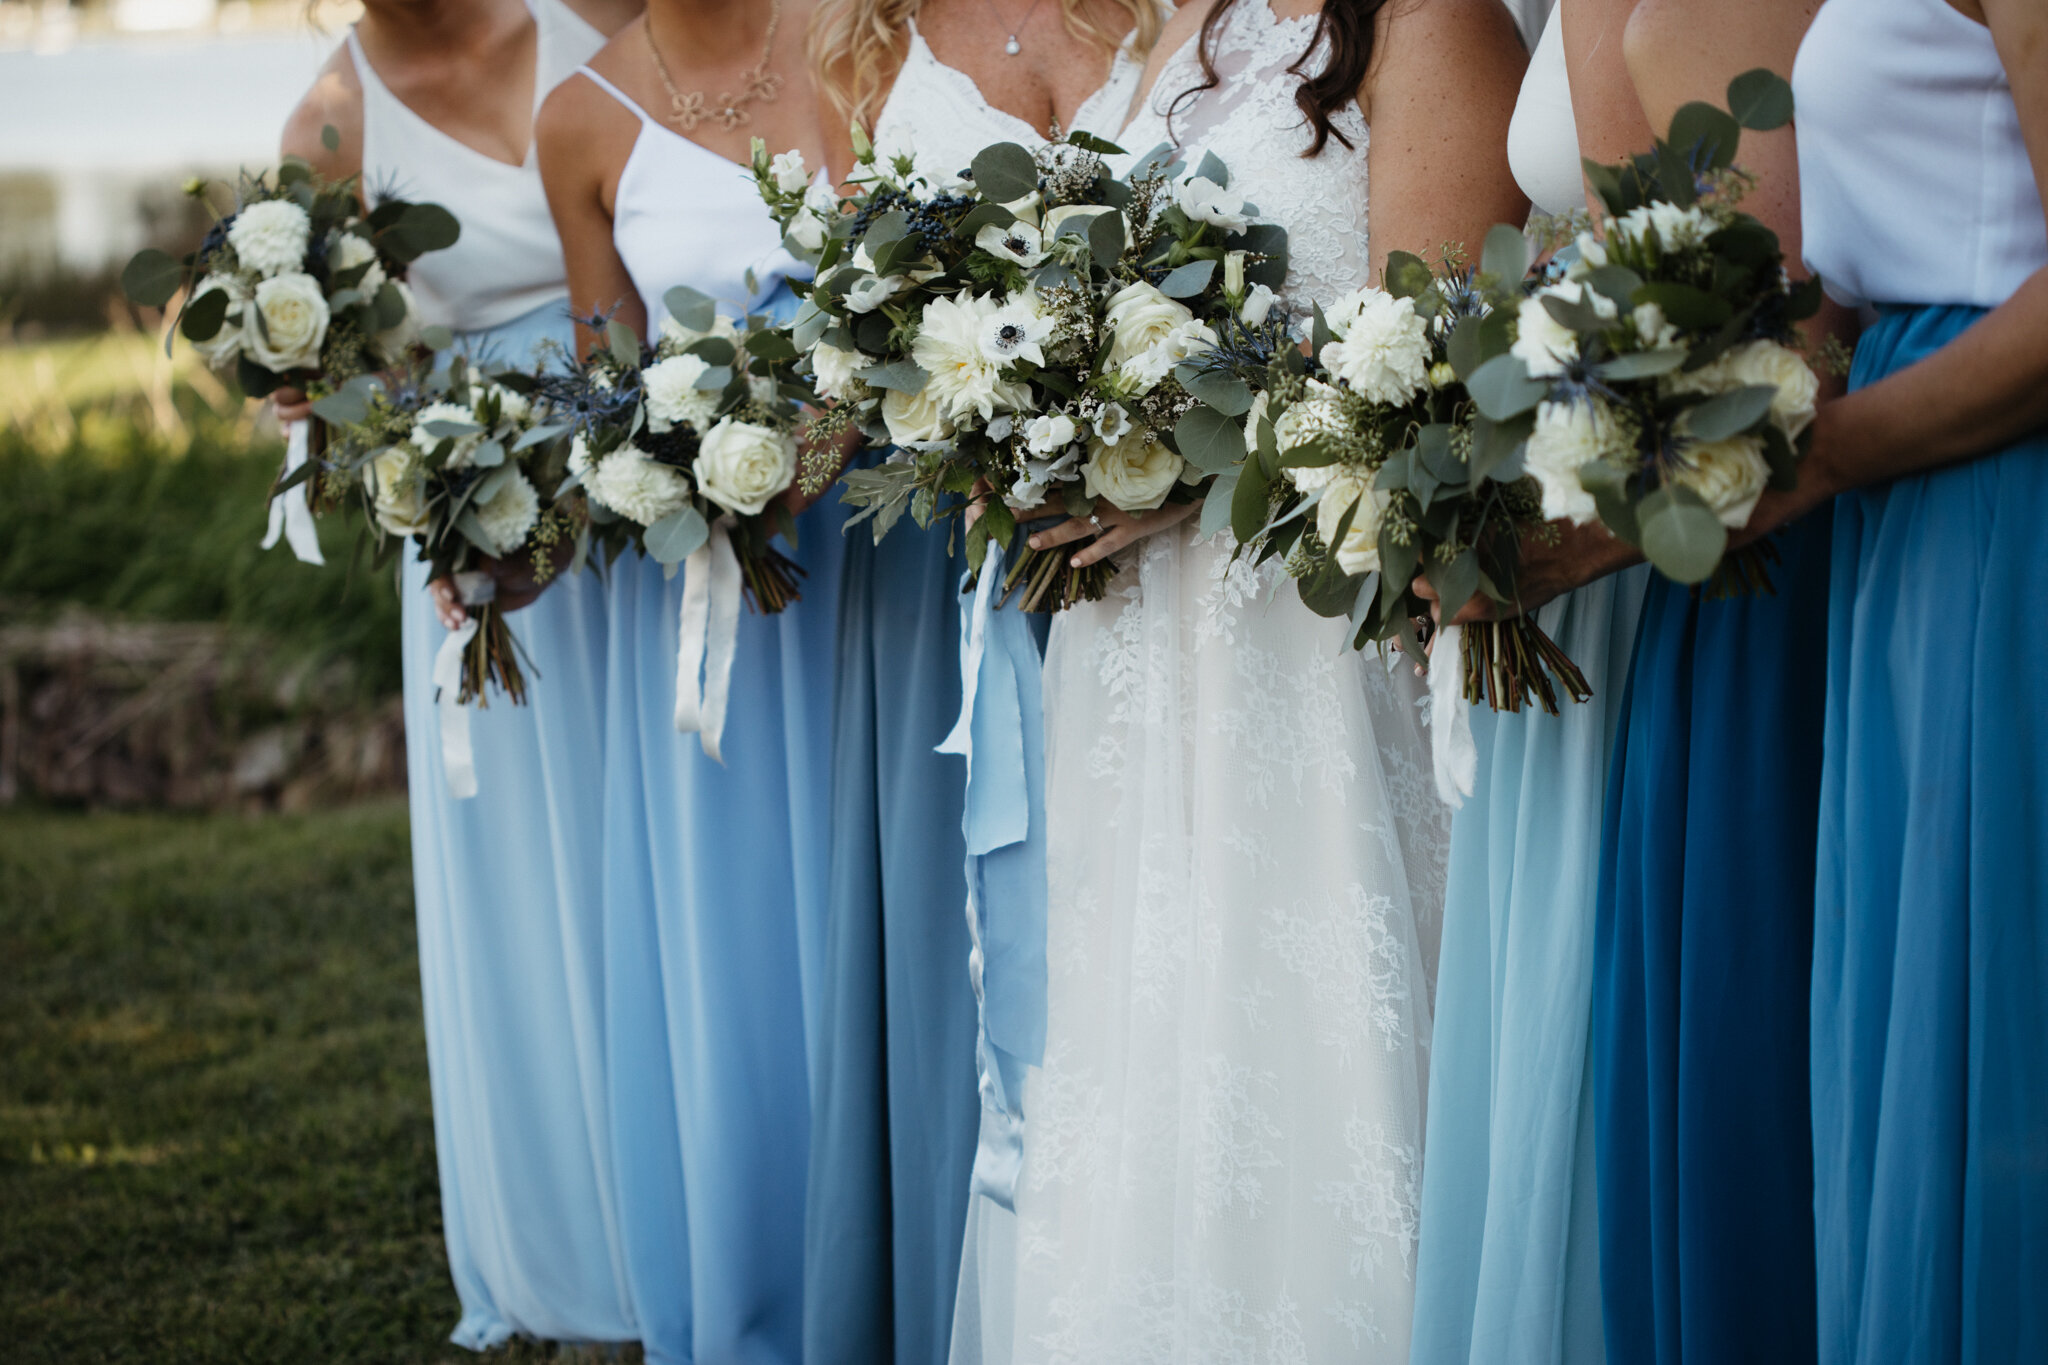 angela_jason_norfolk_wedding-63.jpg